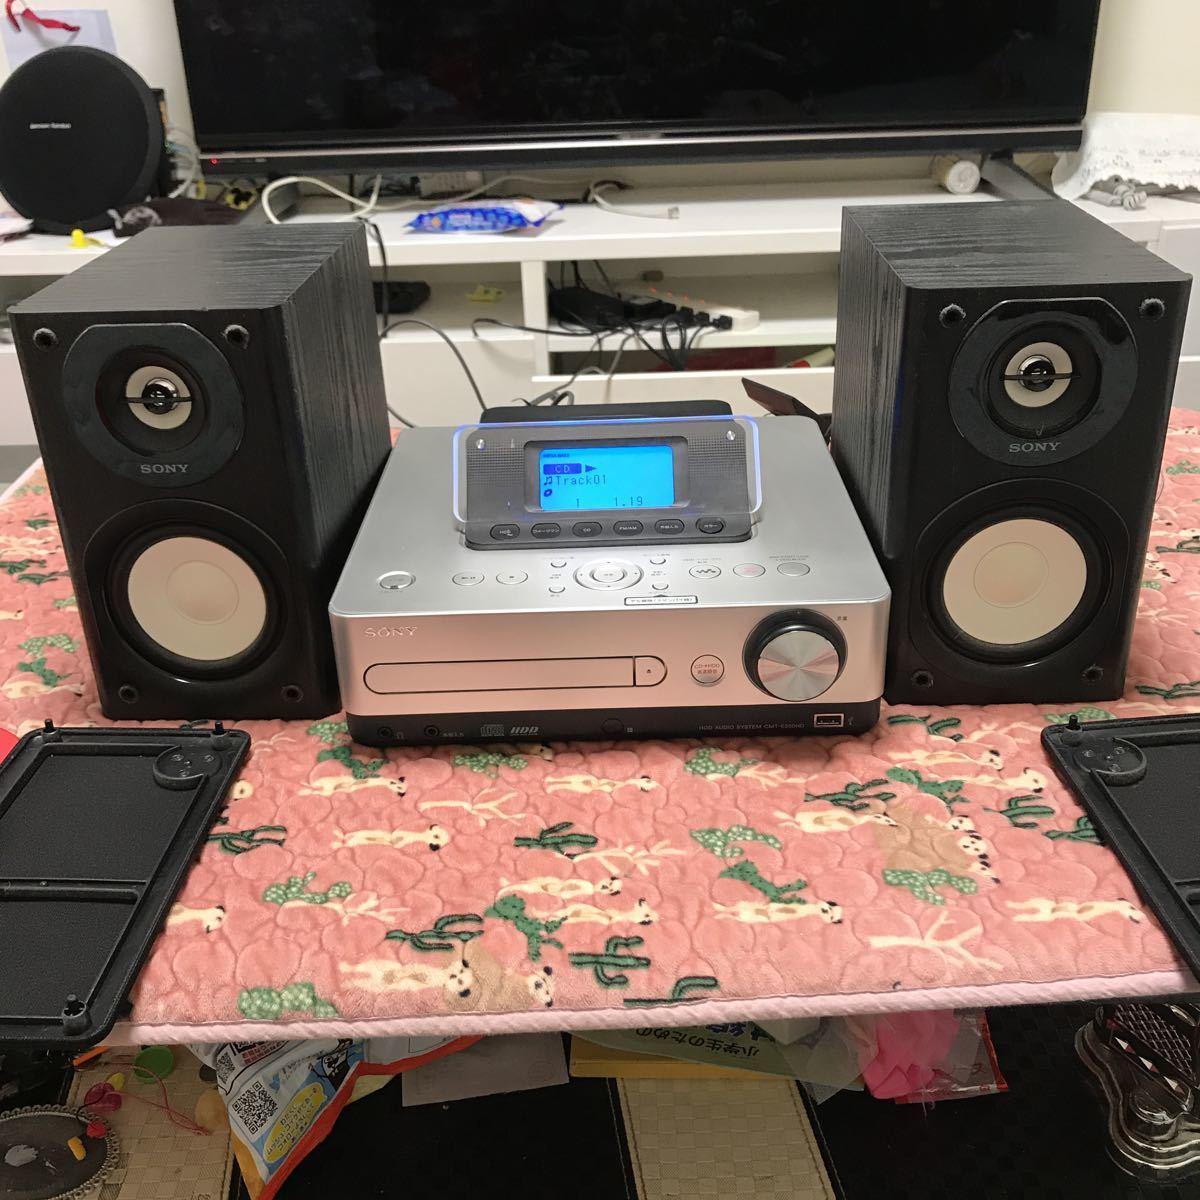 SONY ソニー システムステレオ HDDコンポ CMT-E350HD シルバー 2010年製 音楽 CD ウォークマン リモコン無し 現状お渡し 中古品_画像4